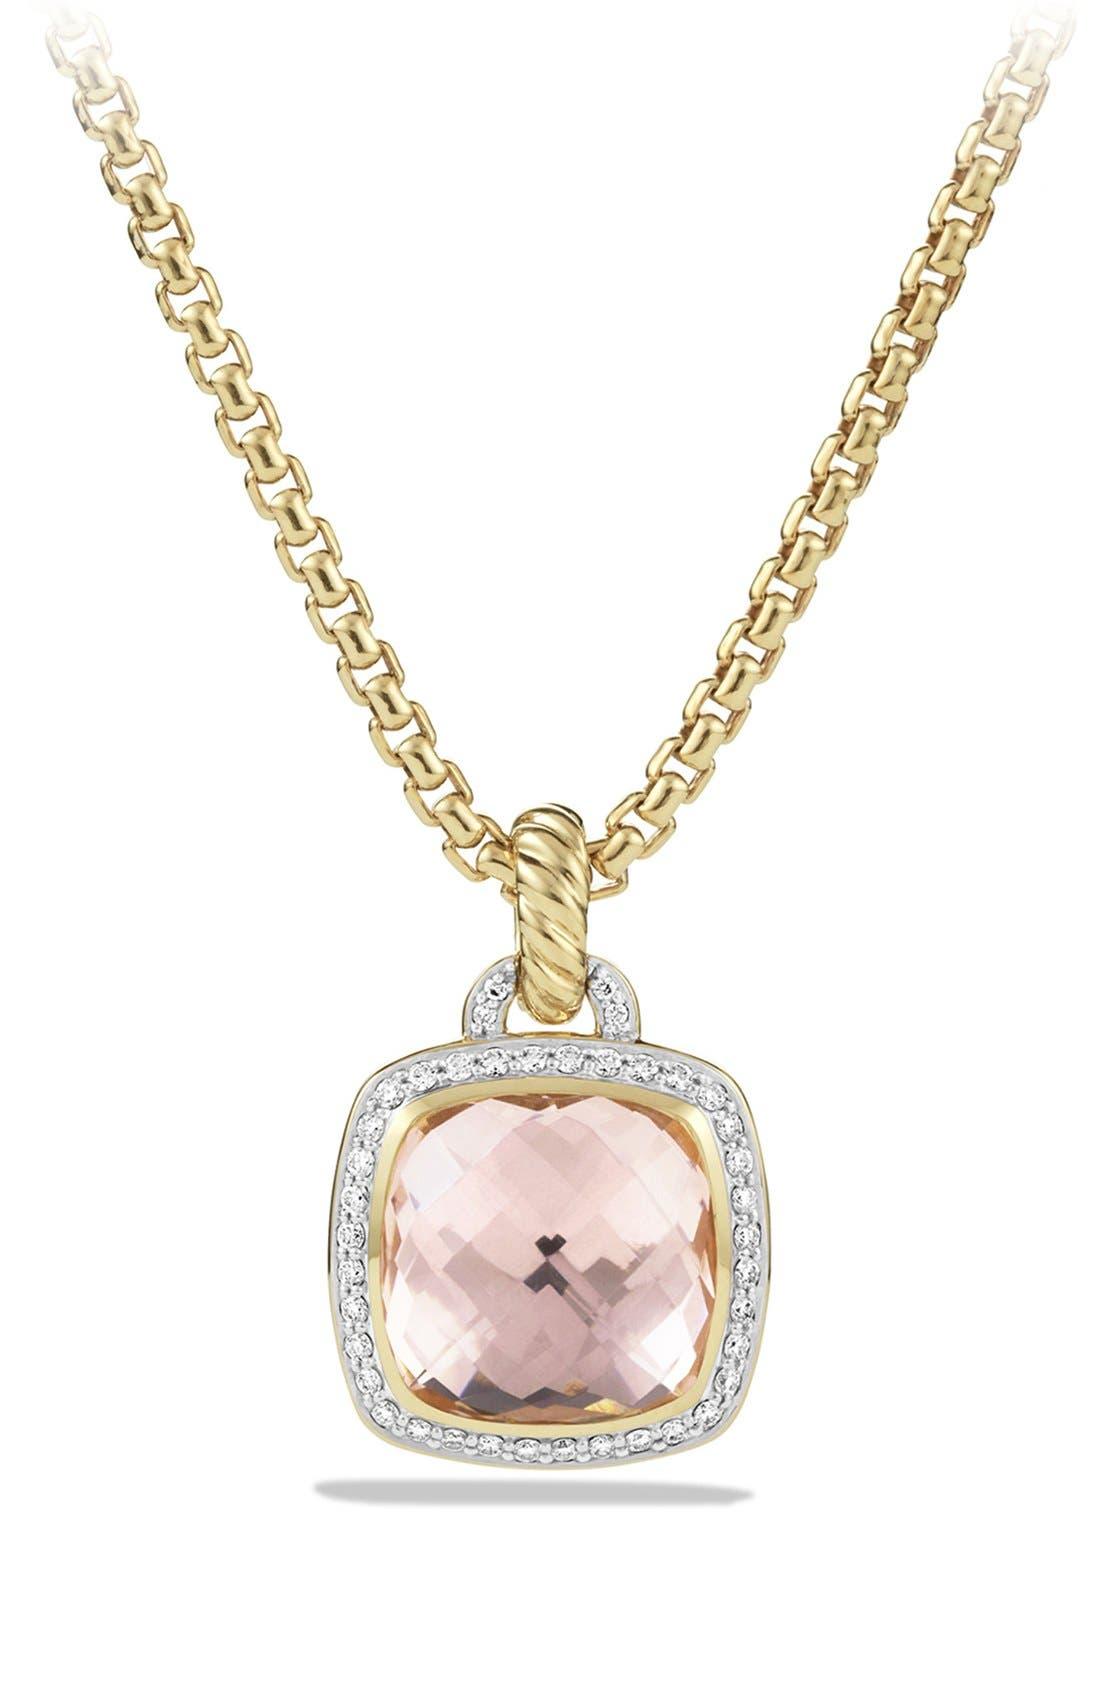 Main Image - David Yurman 'Albion' Pendant with Lemon Citrine and Diamonds in 18k Gold